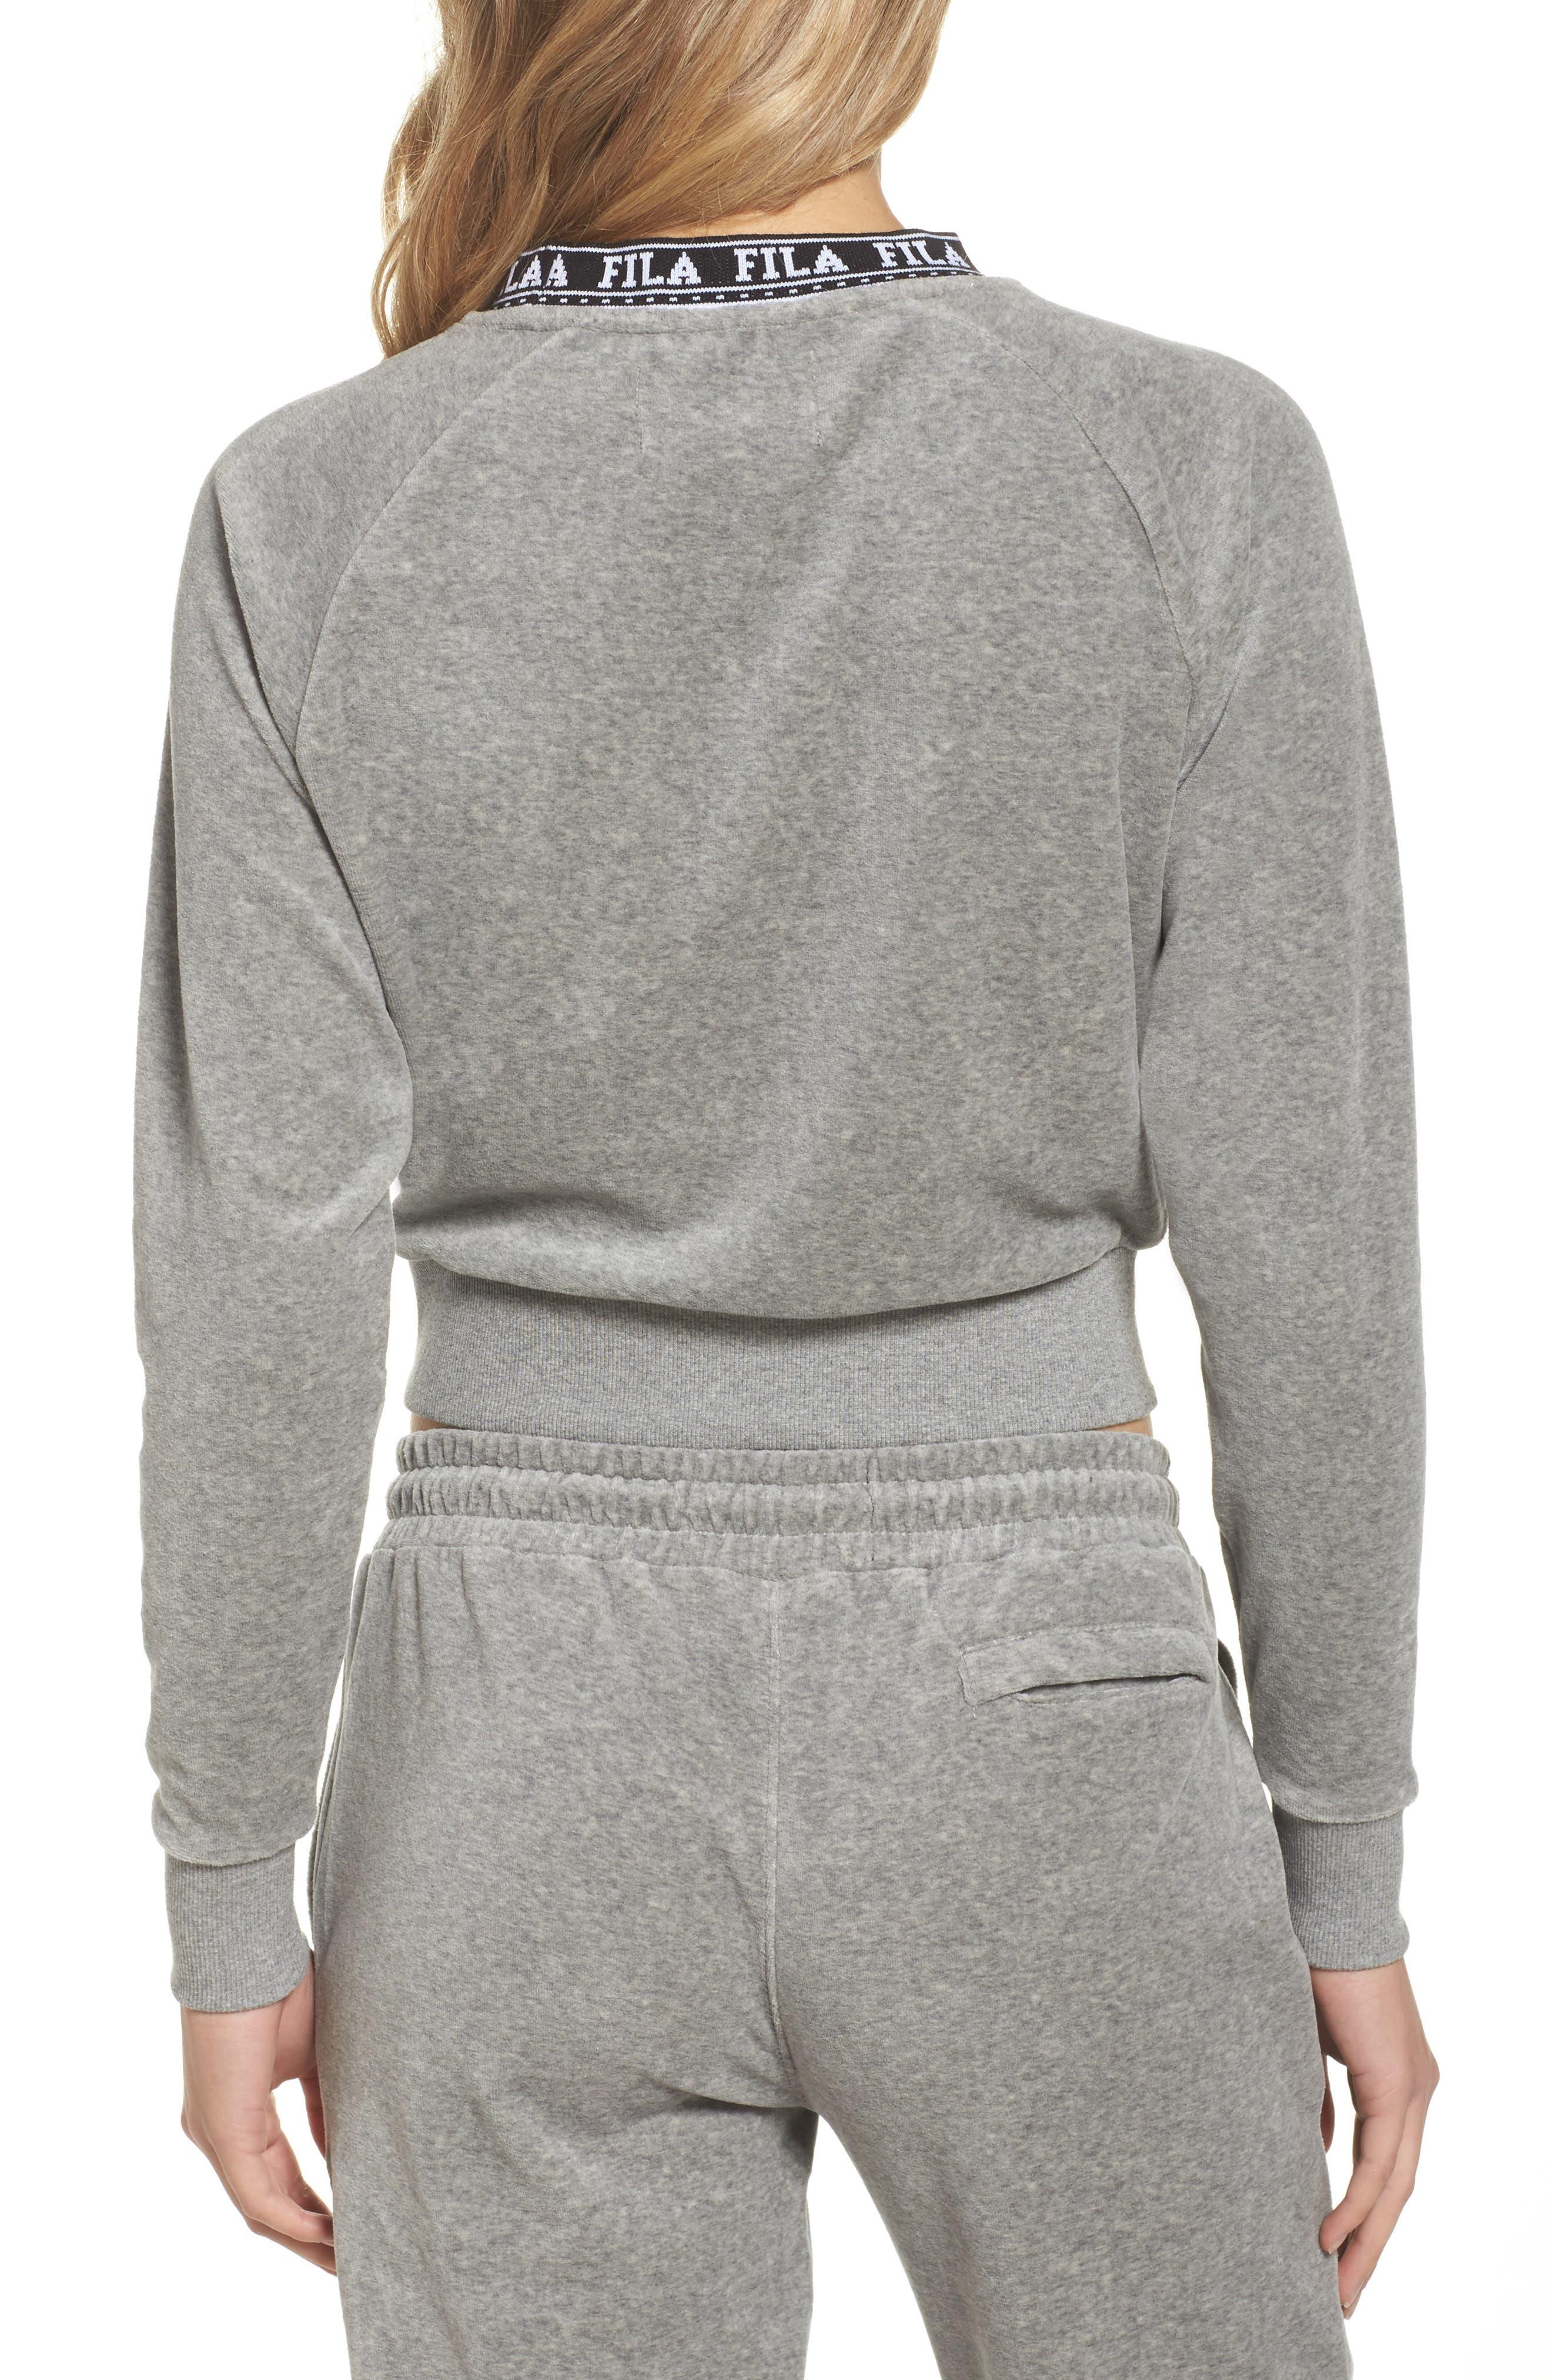 Dina Velour Crop Sweatshirt,                             Alternate thumbnail 2, color,                             Grey Heather/ Black/ White